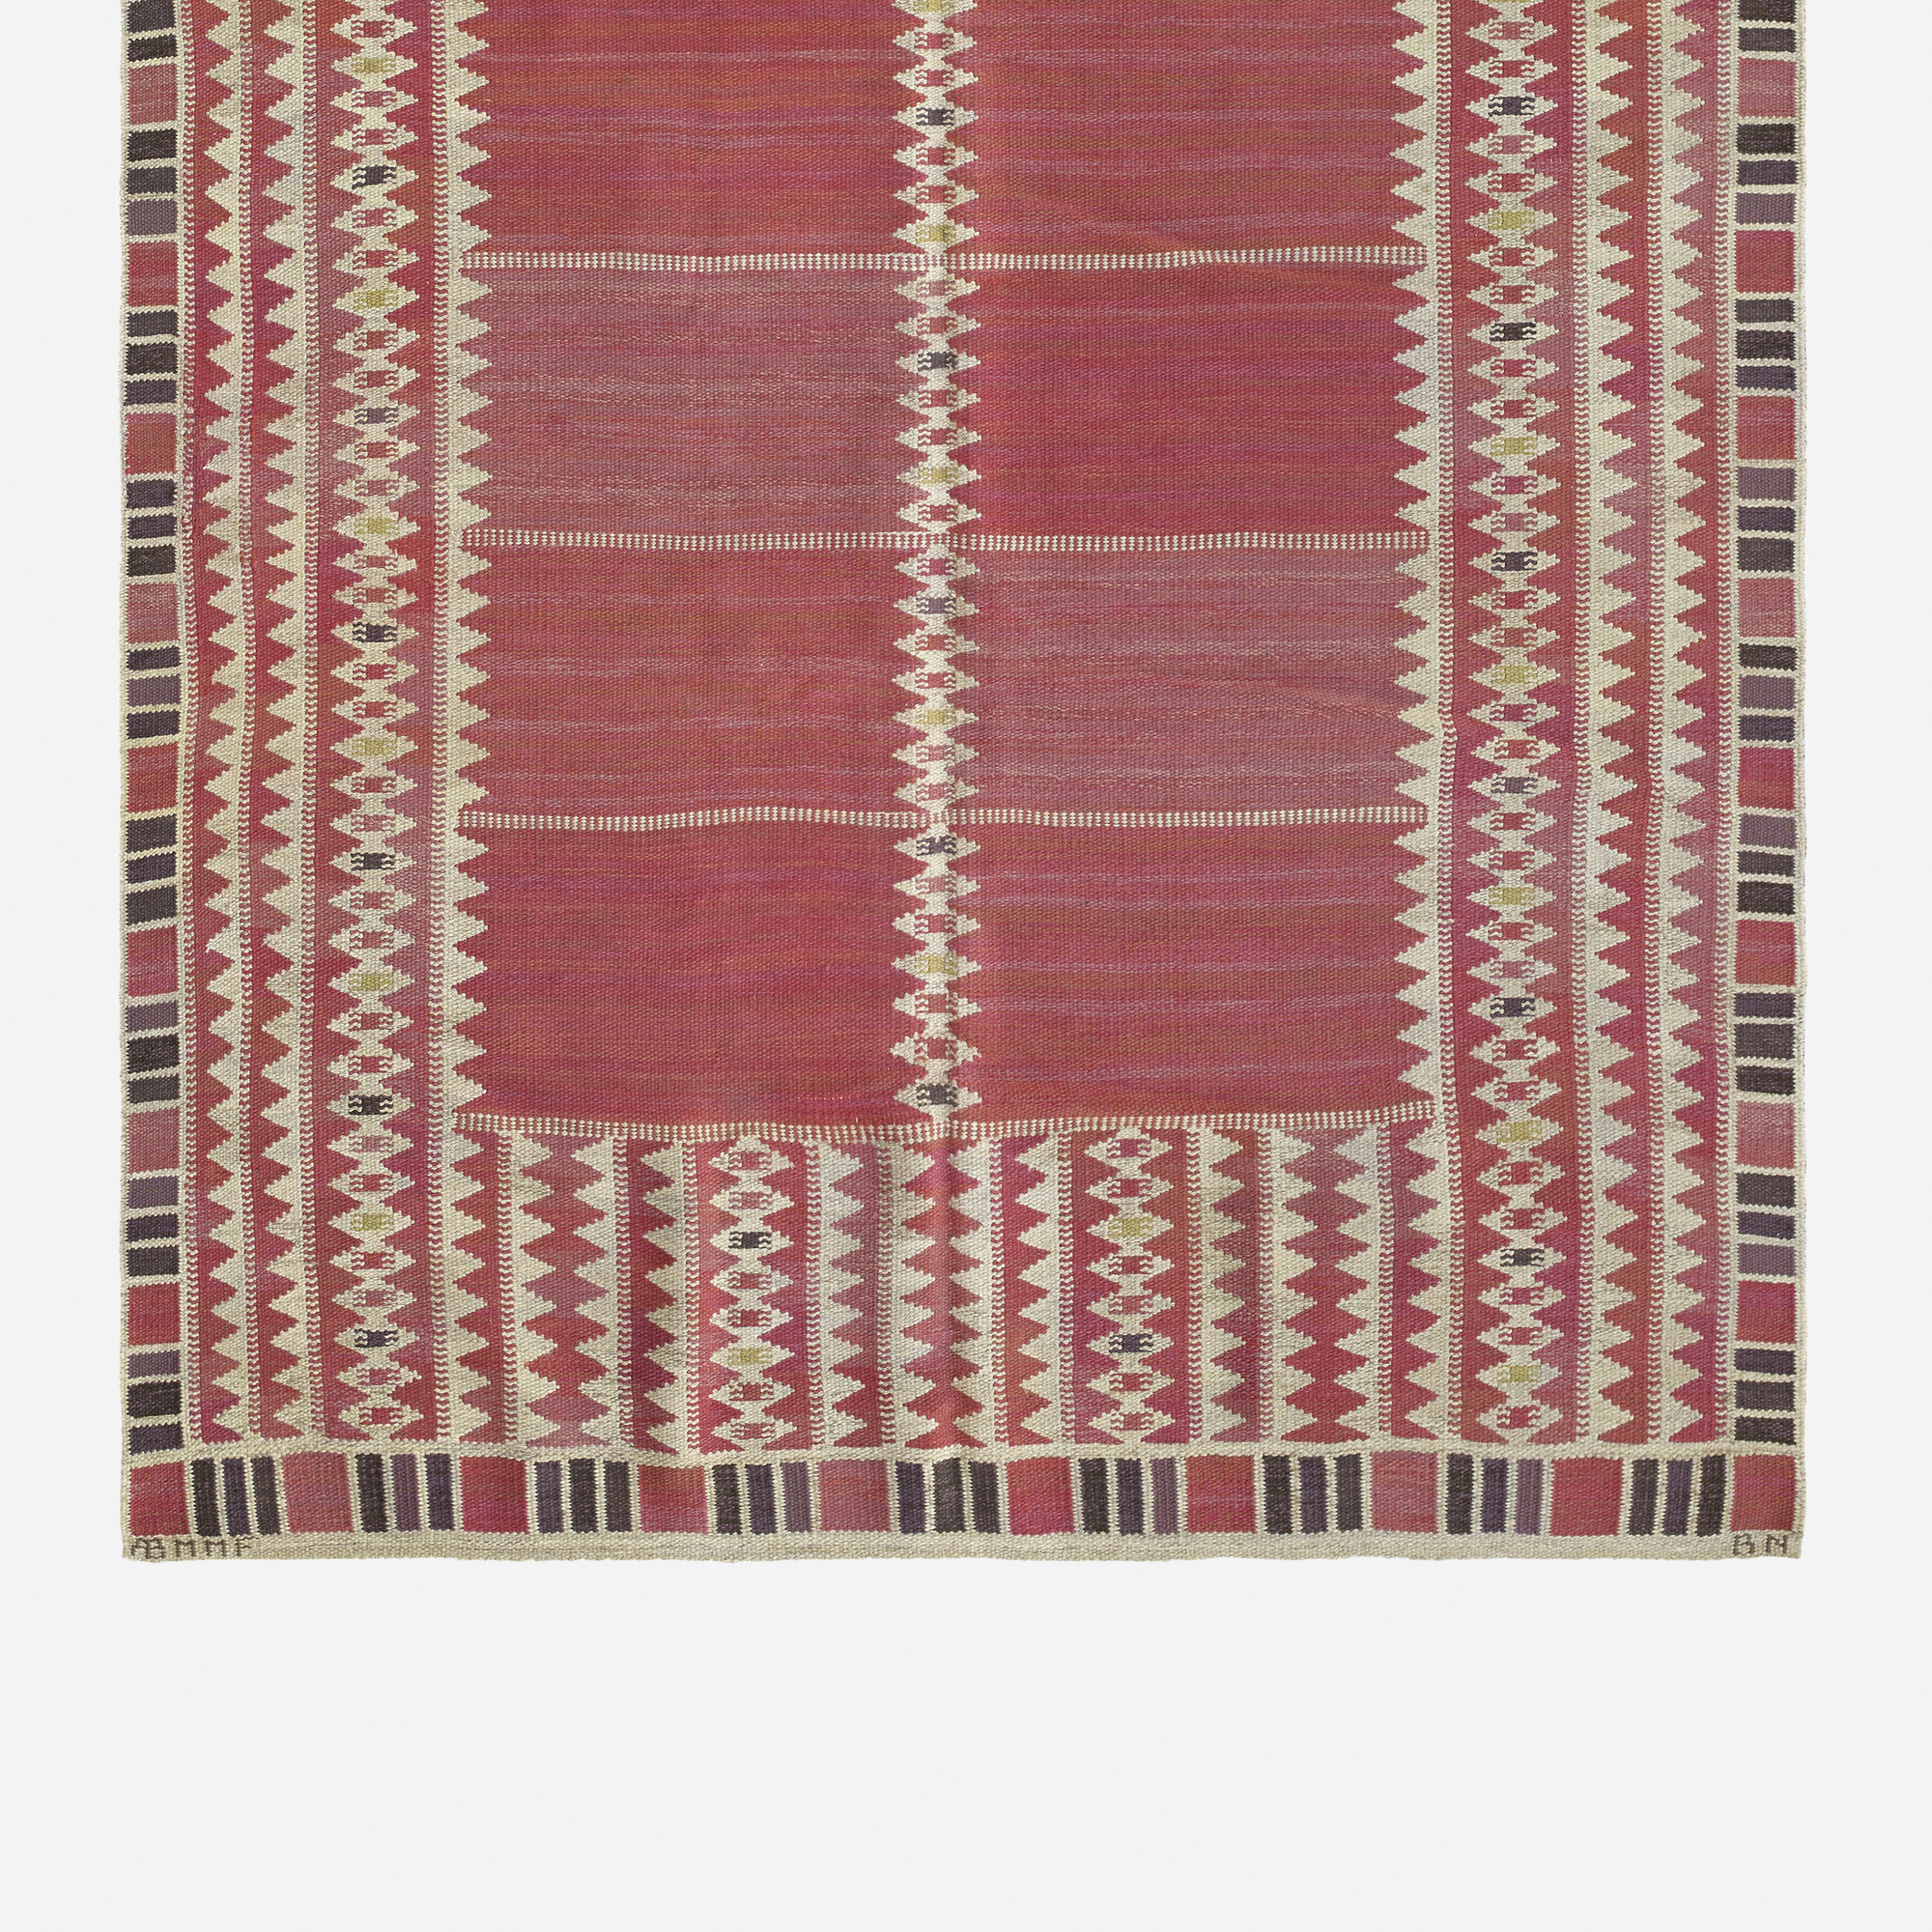 129: Barbro Nilsson / Salerno flatweave carpet (2 of 2)